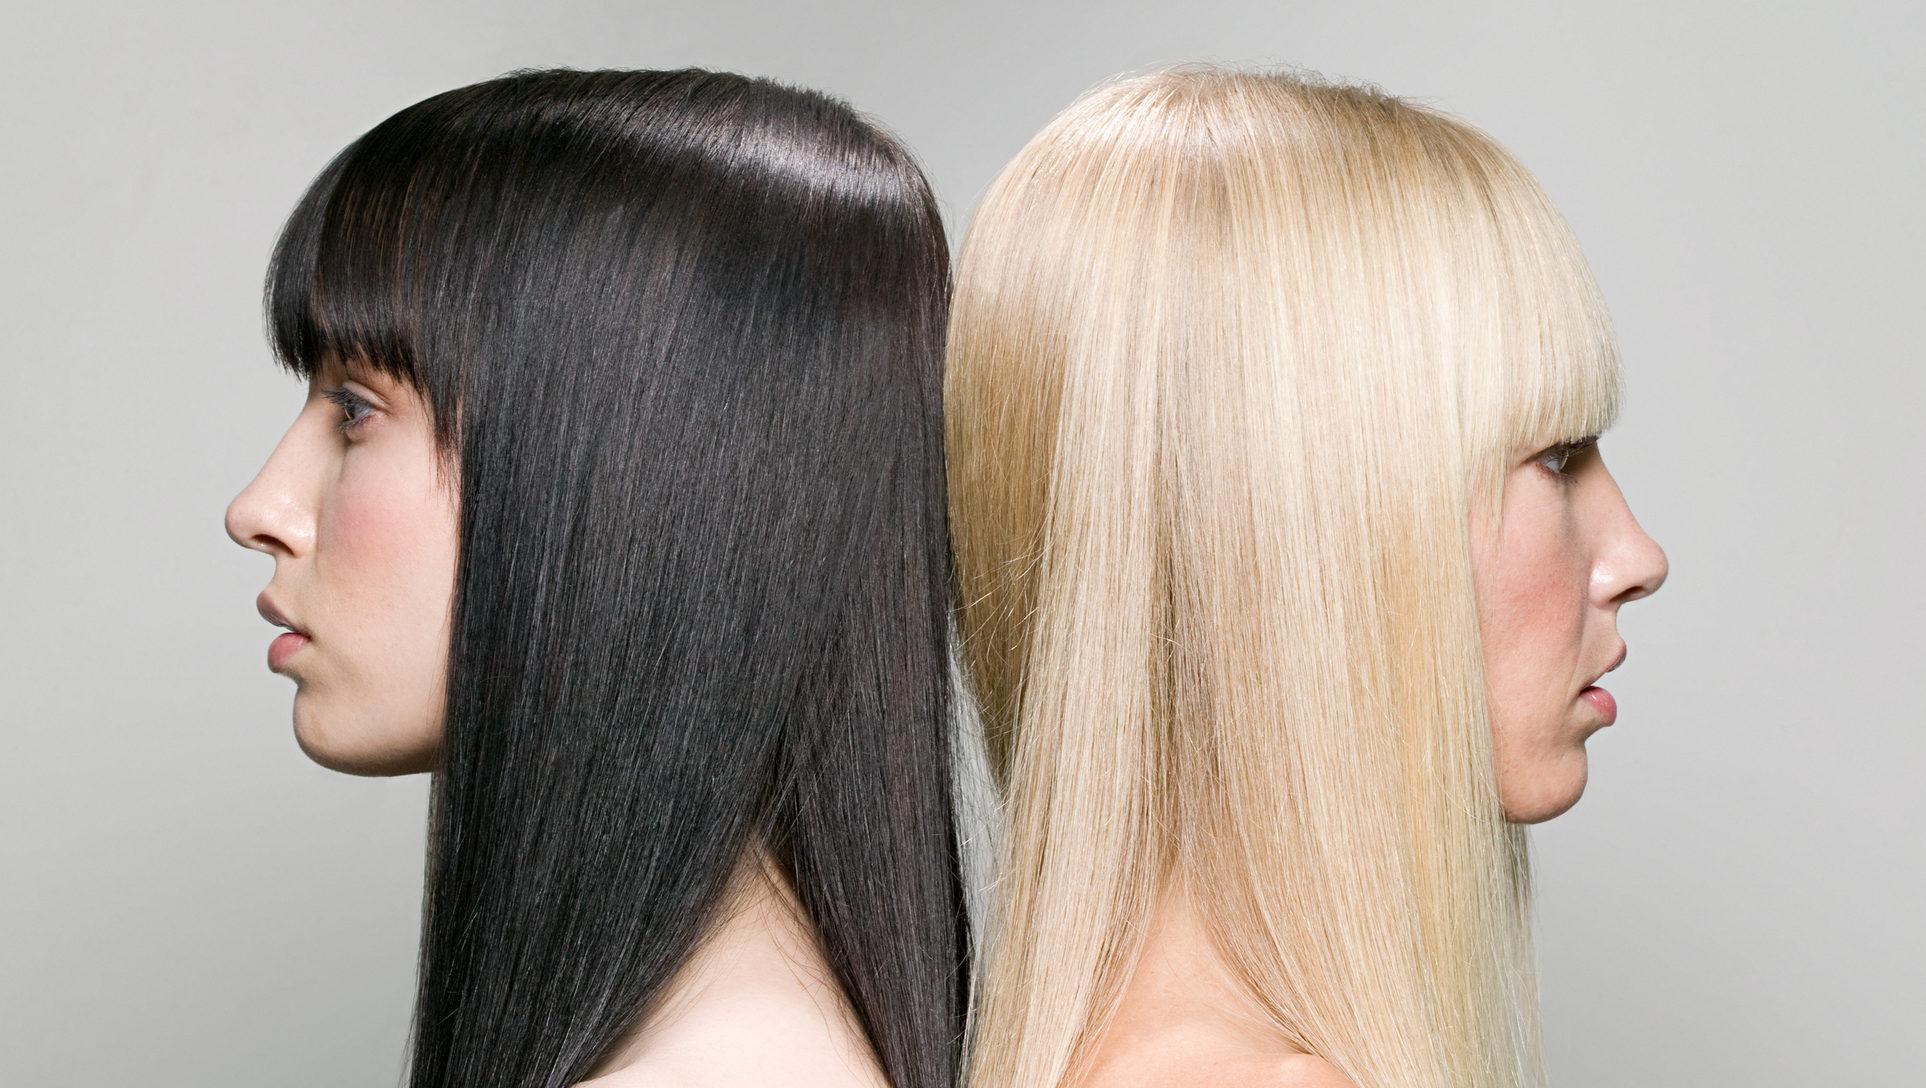 Farbabzug Mit Efassor Die Haarfarbe Entfernen Desiredde